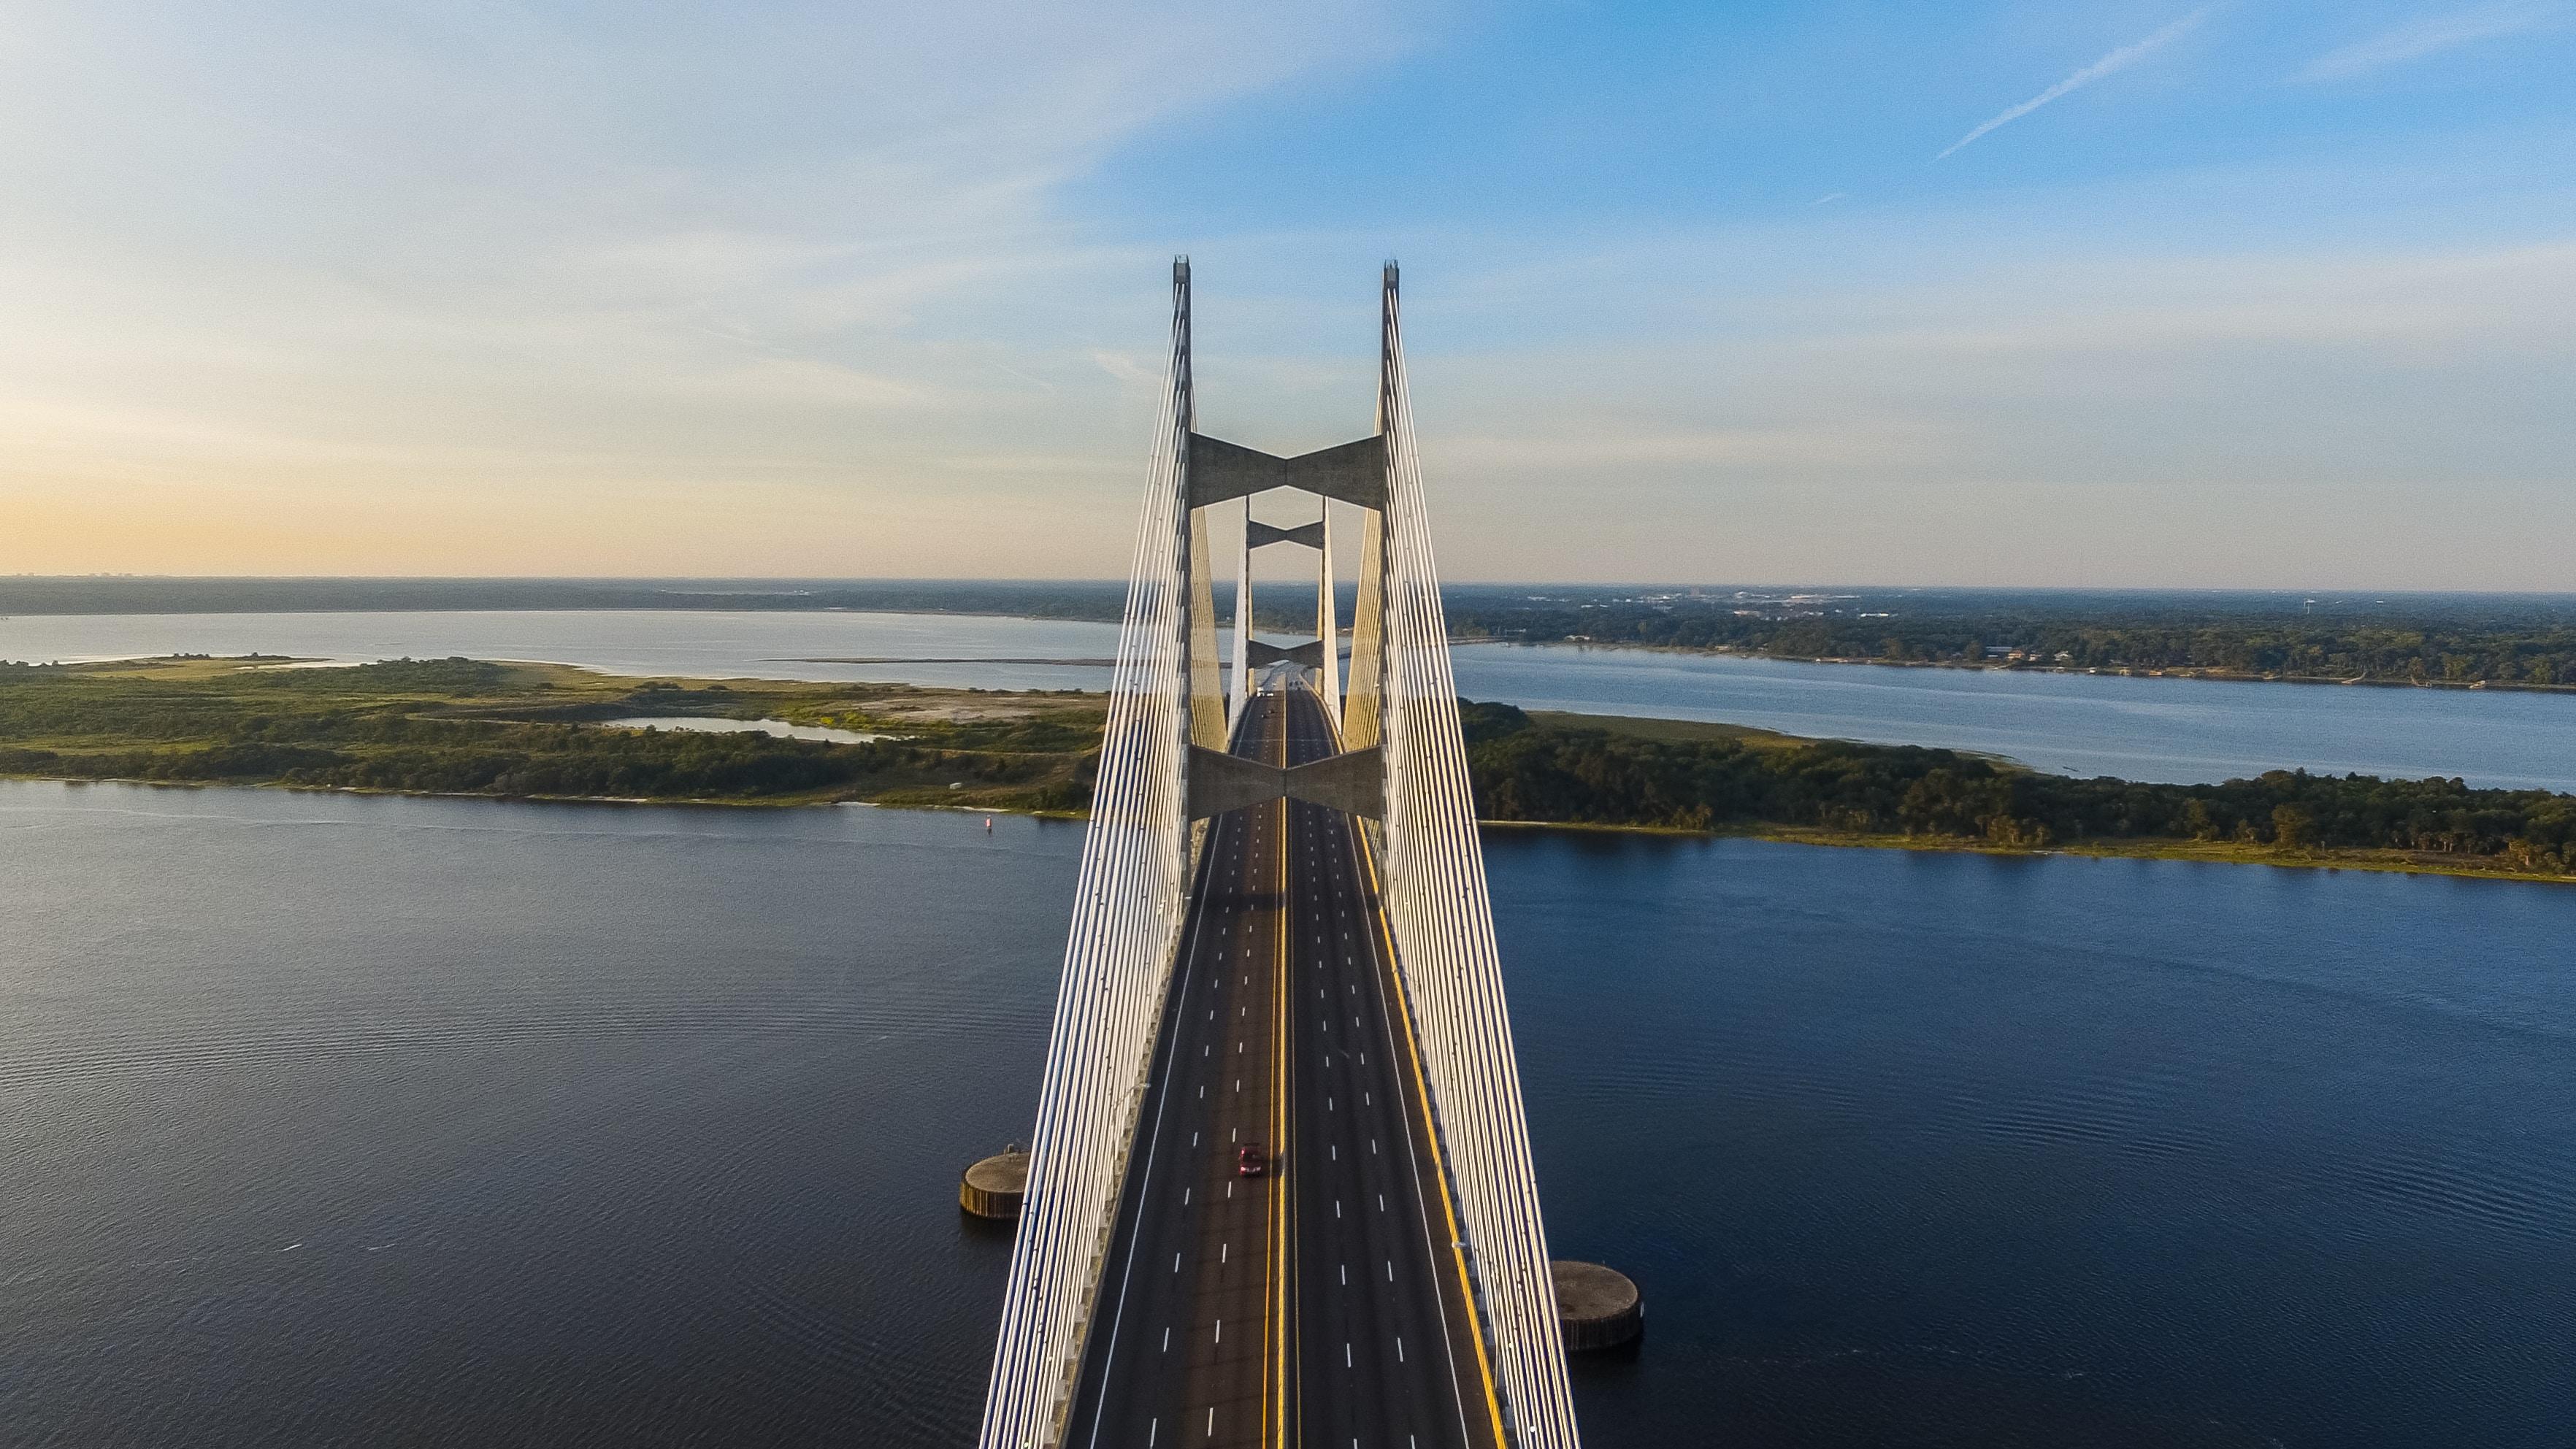 aerial view of bridge during daytime